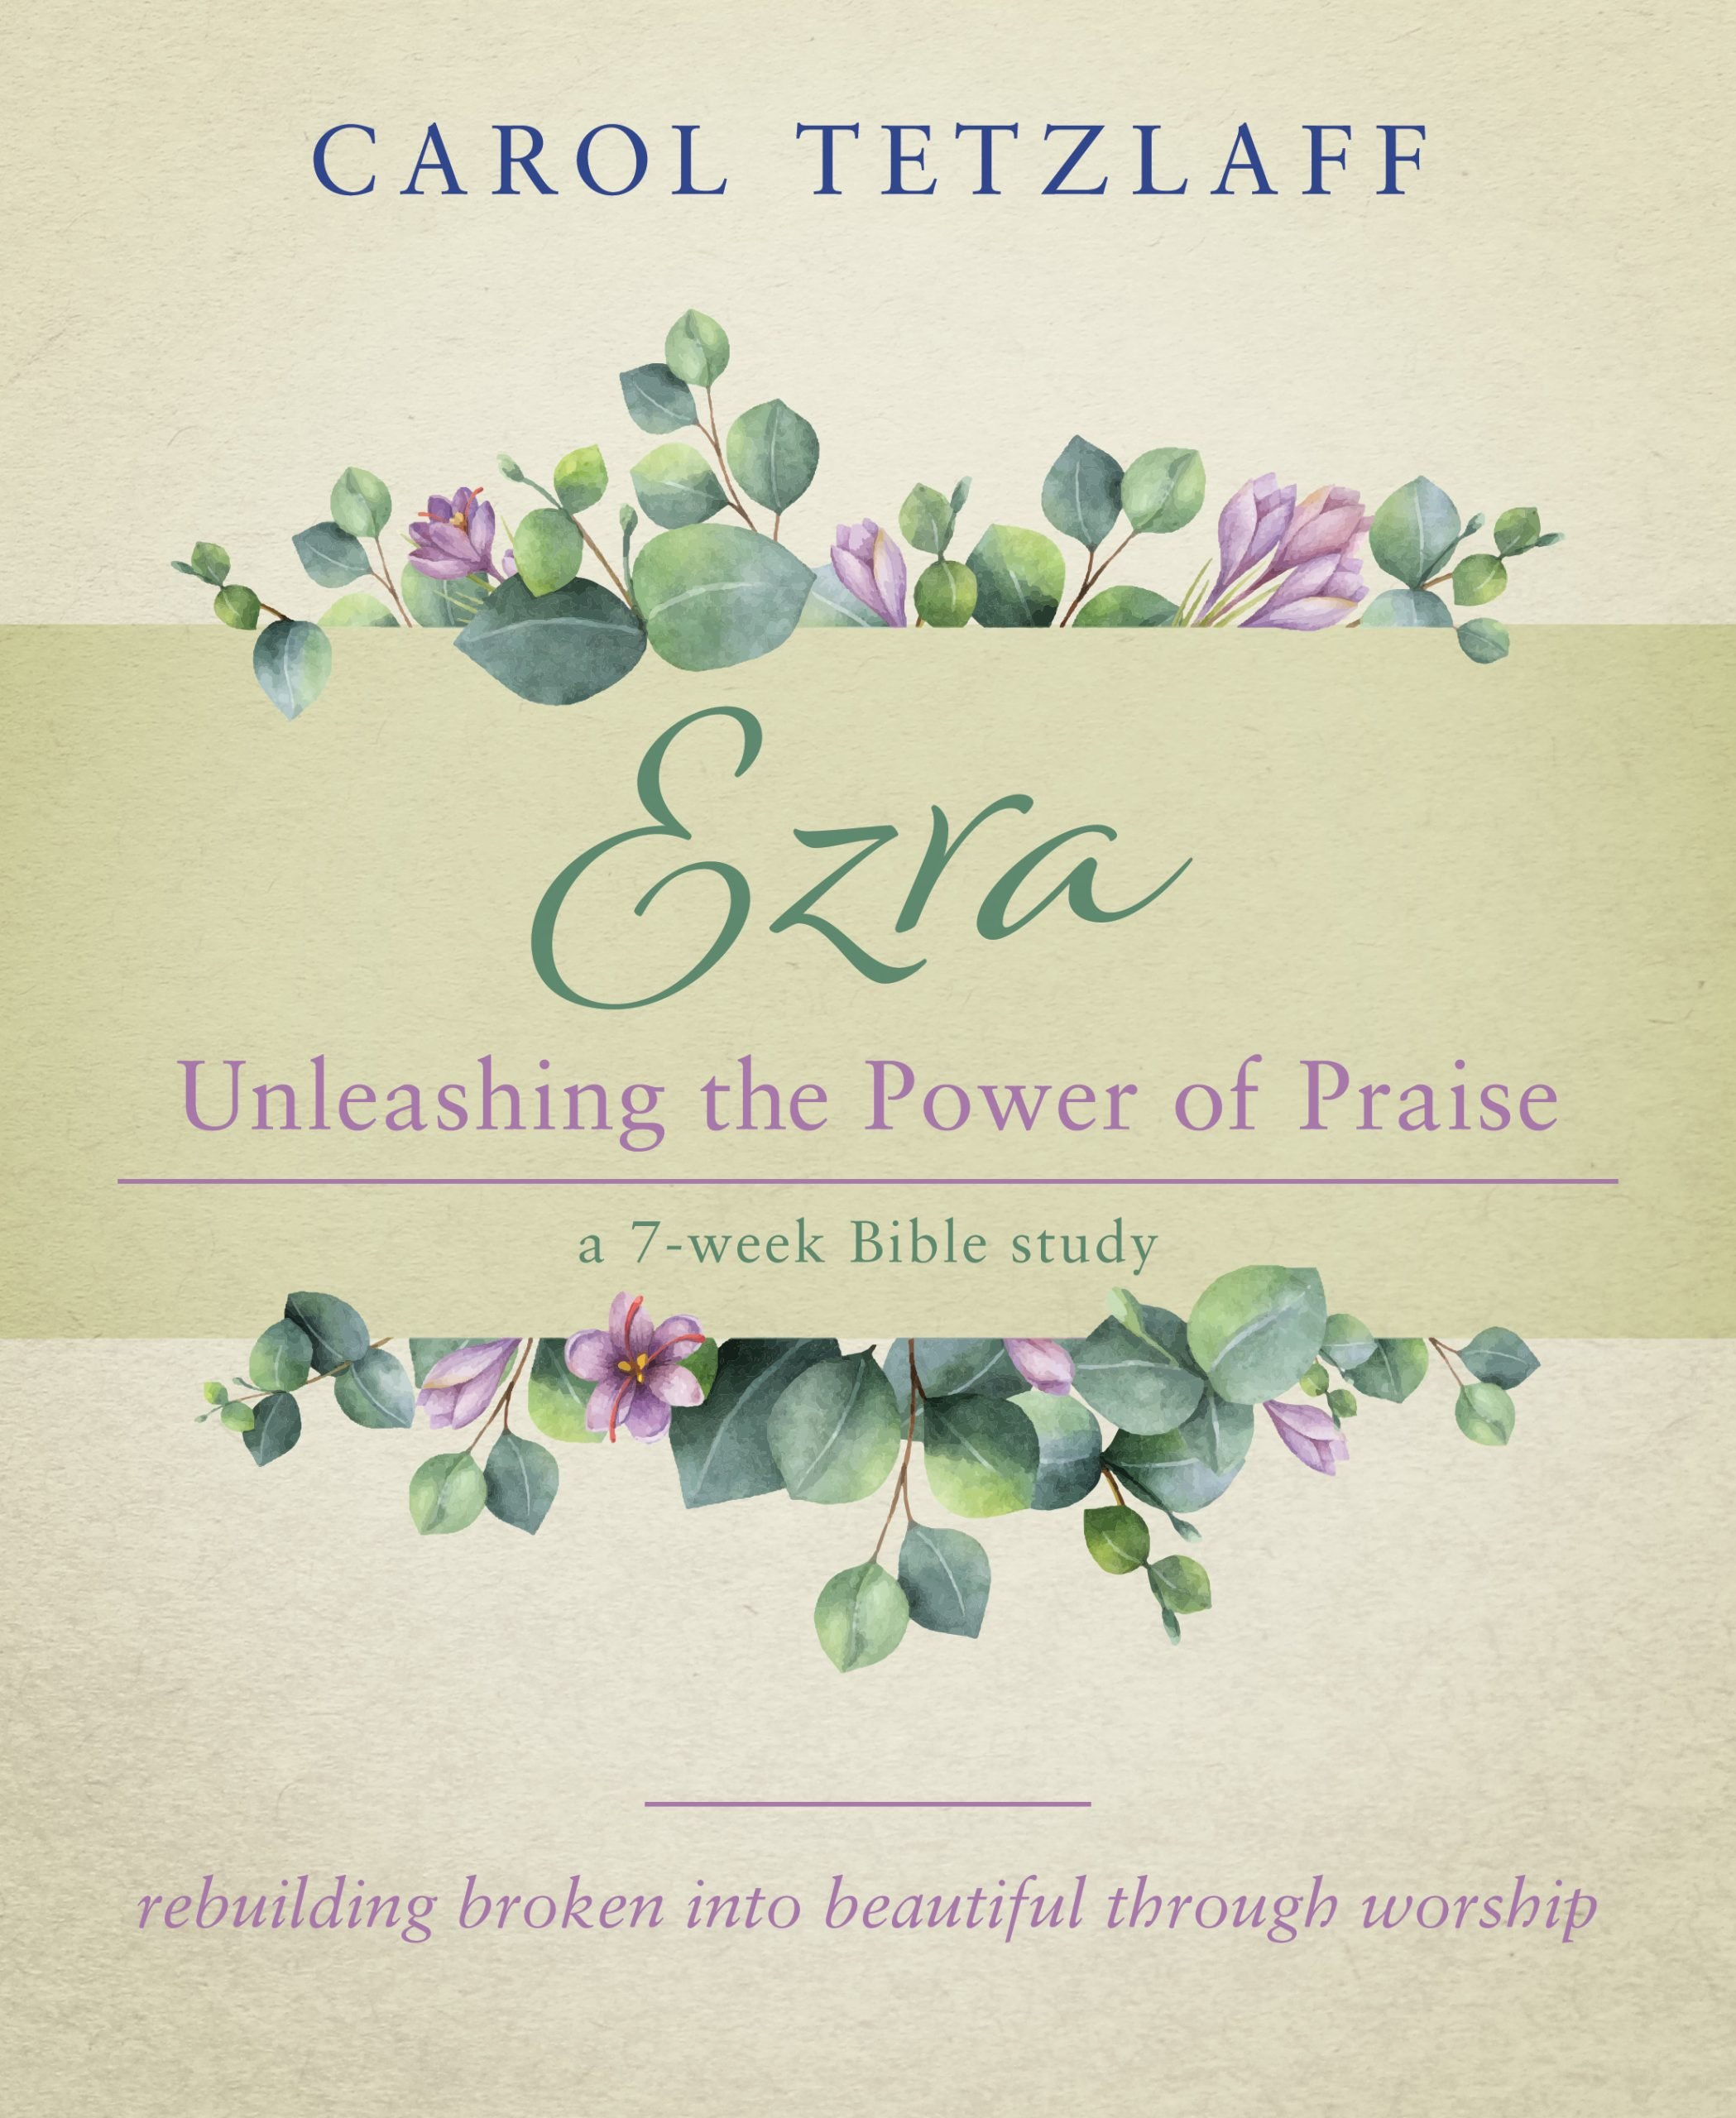 Ezra Bible Study